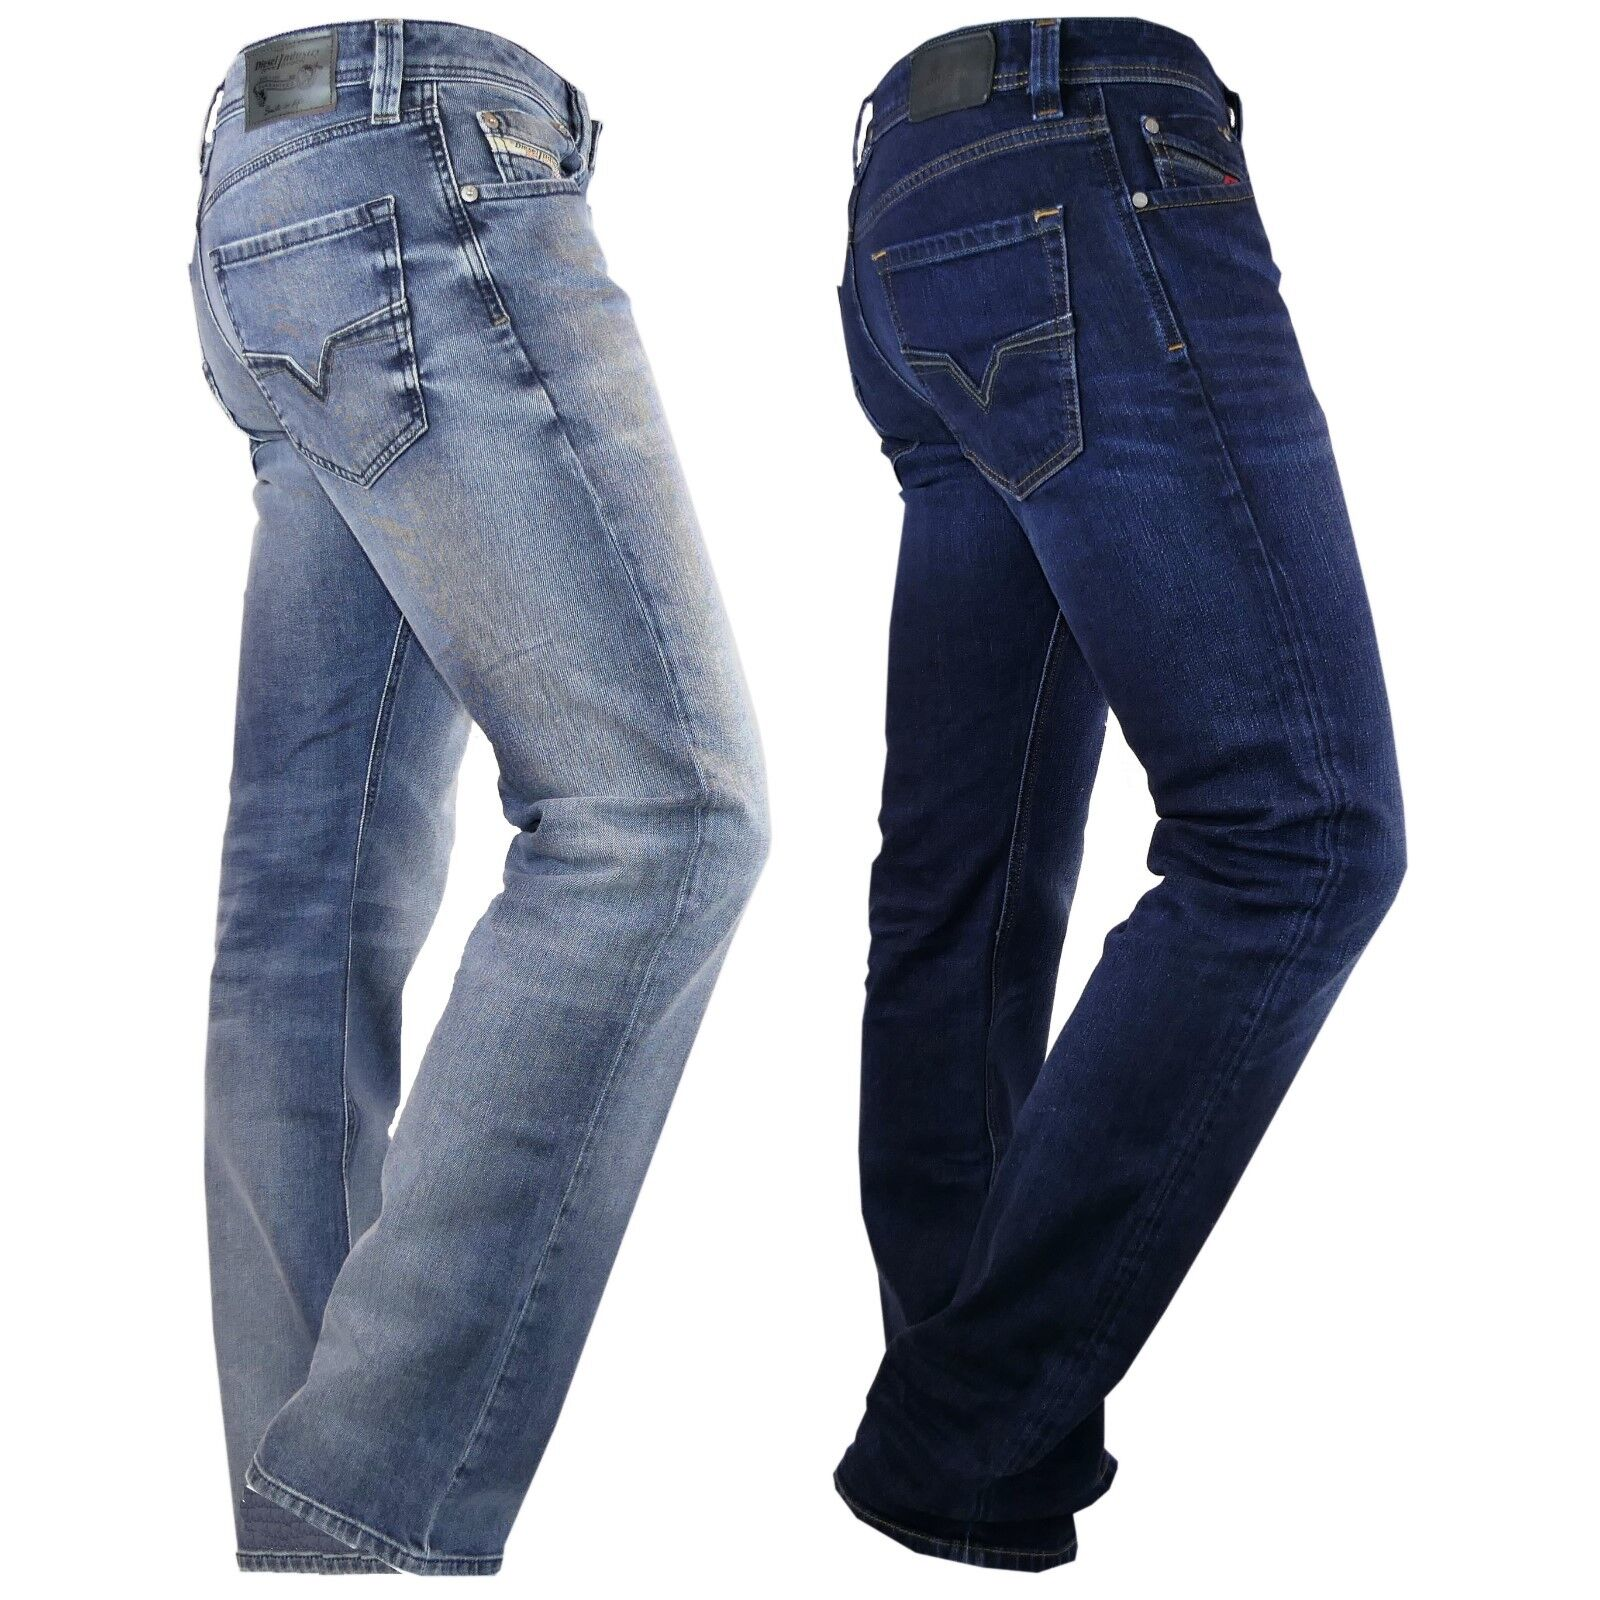 Diesel Jeans Larkee gerade Herren Hose dunkelblau hellblau Regular weit neu